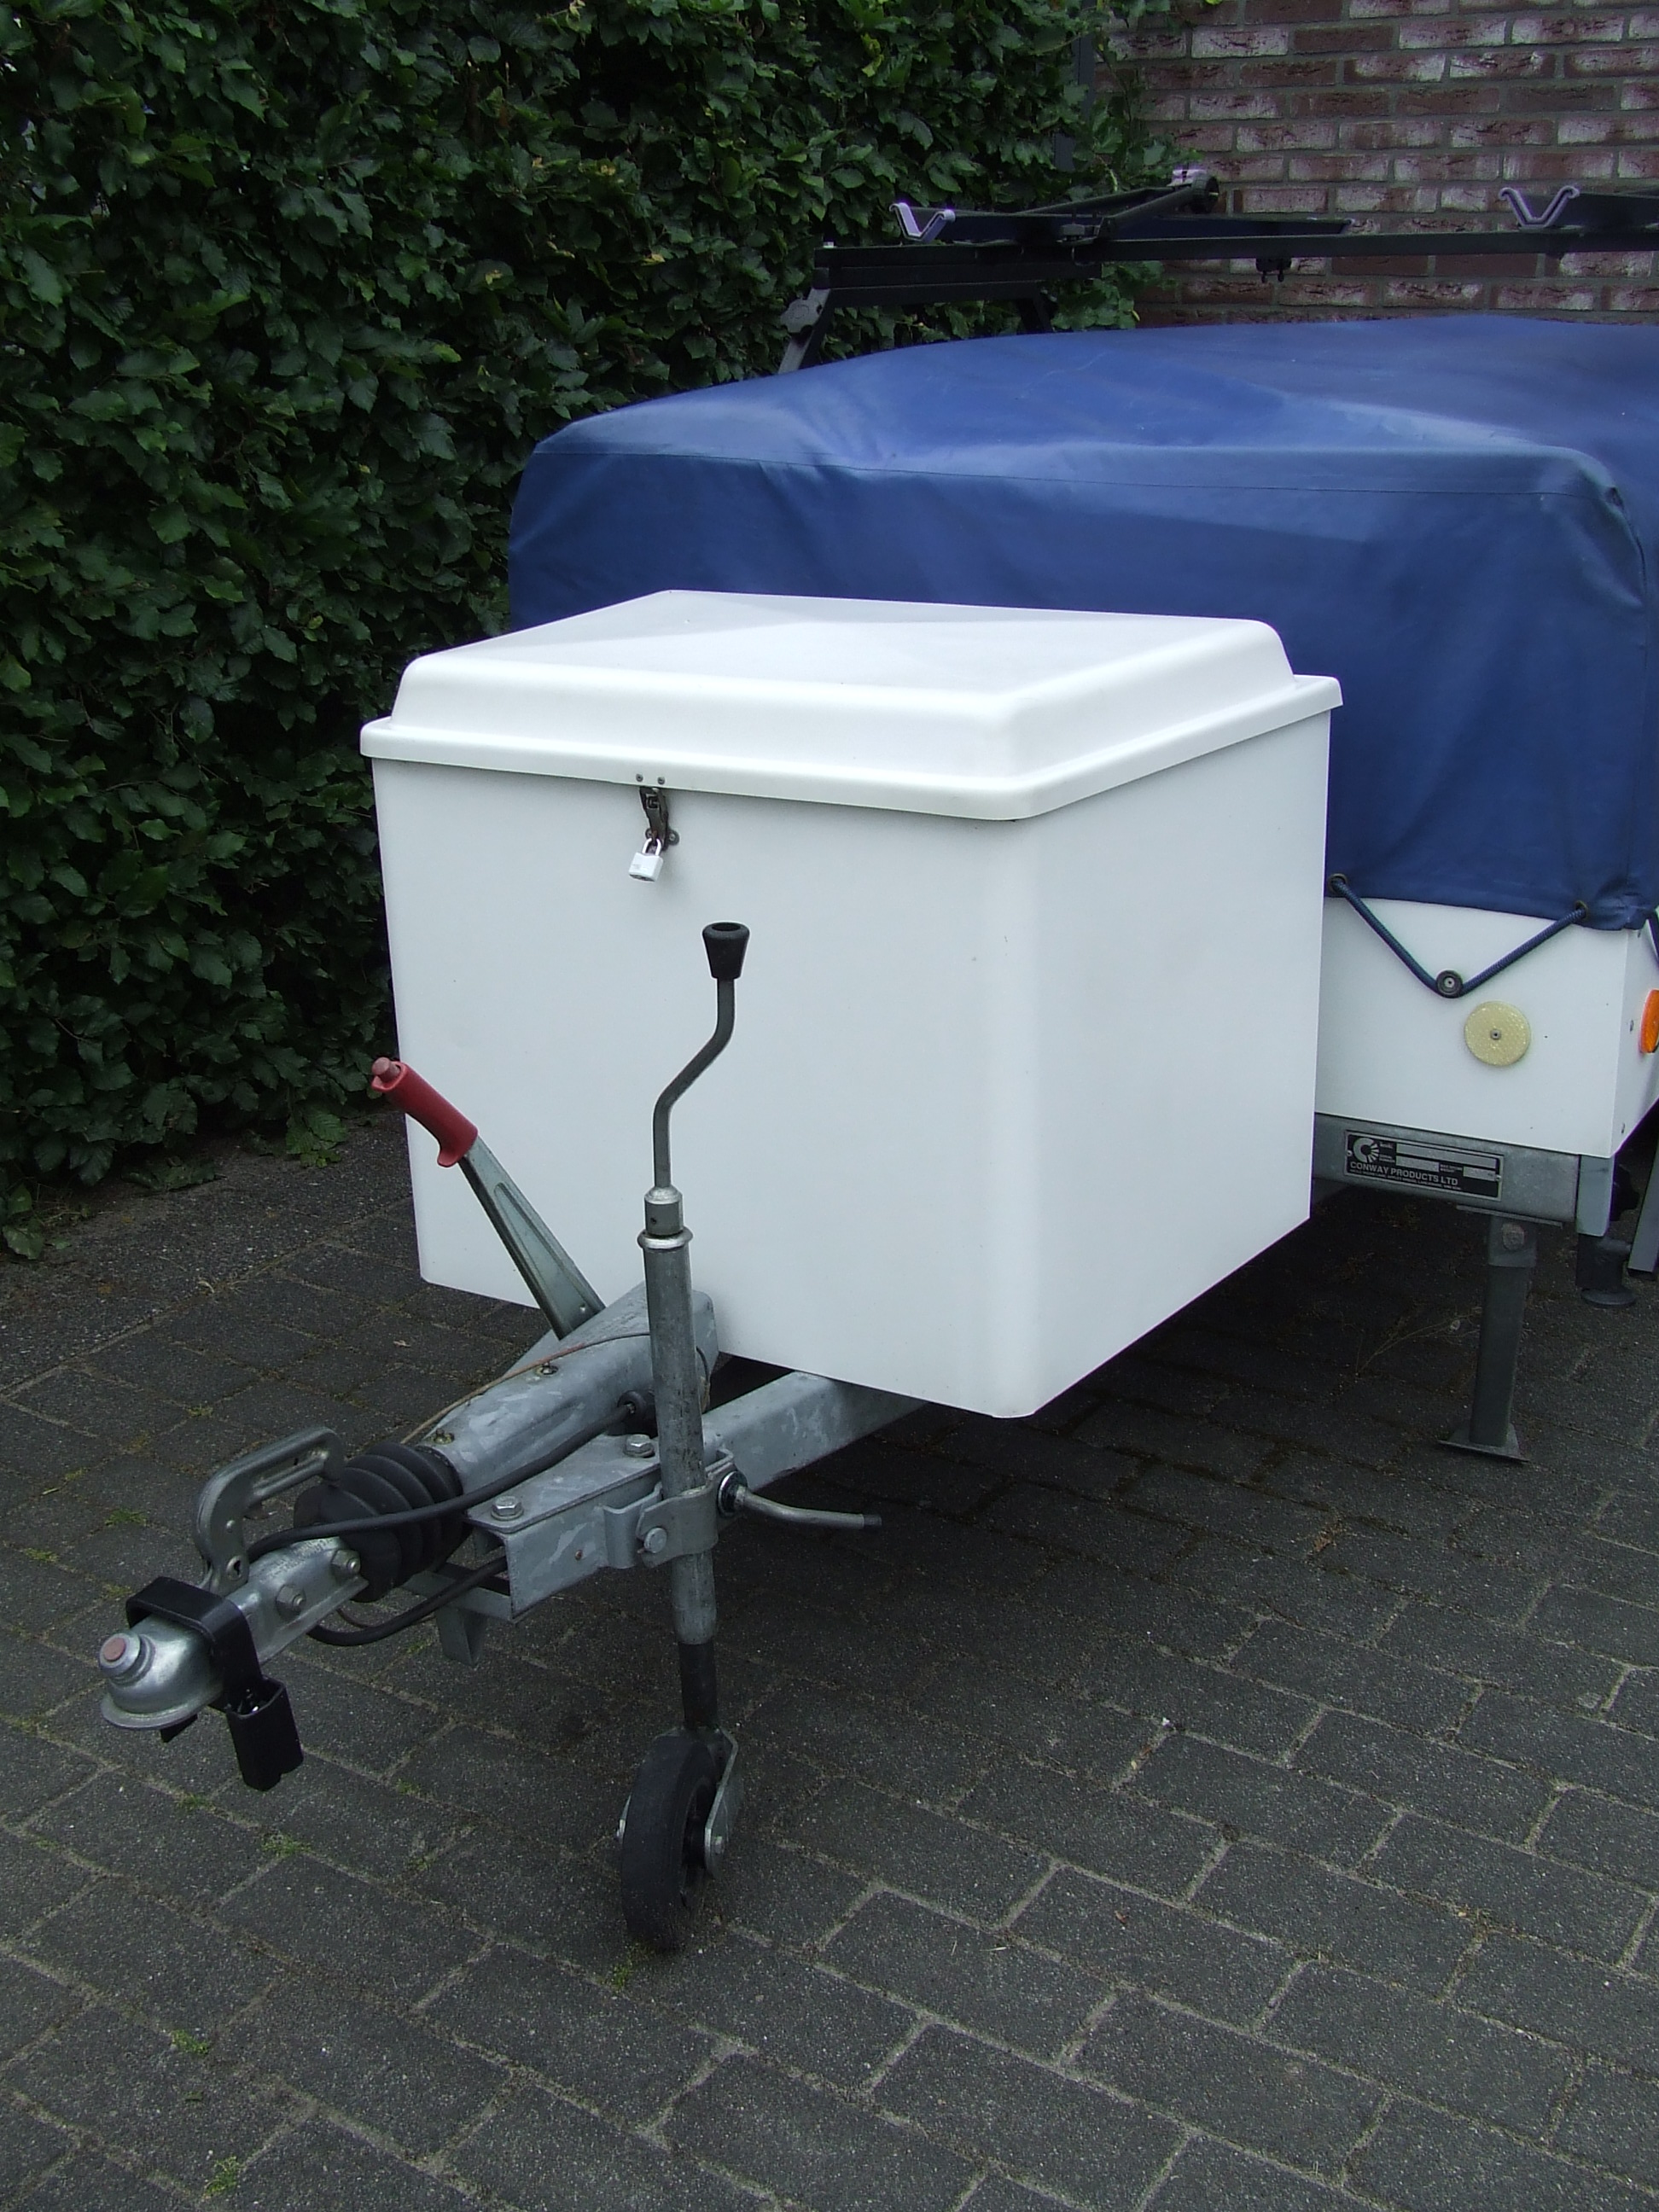 Nette Conway Cambridge 300DL, 1995 (vouwwagen)   Bokt.nl